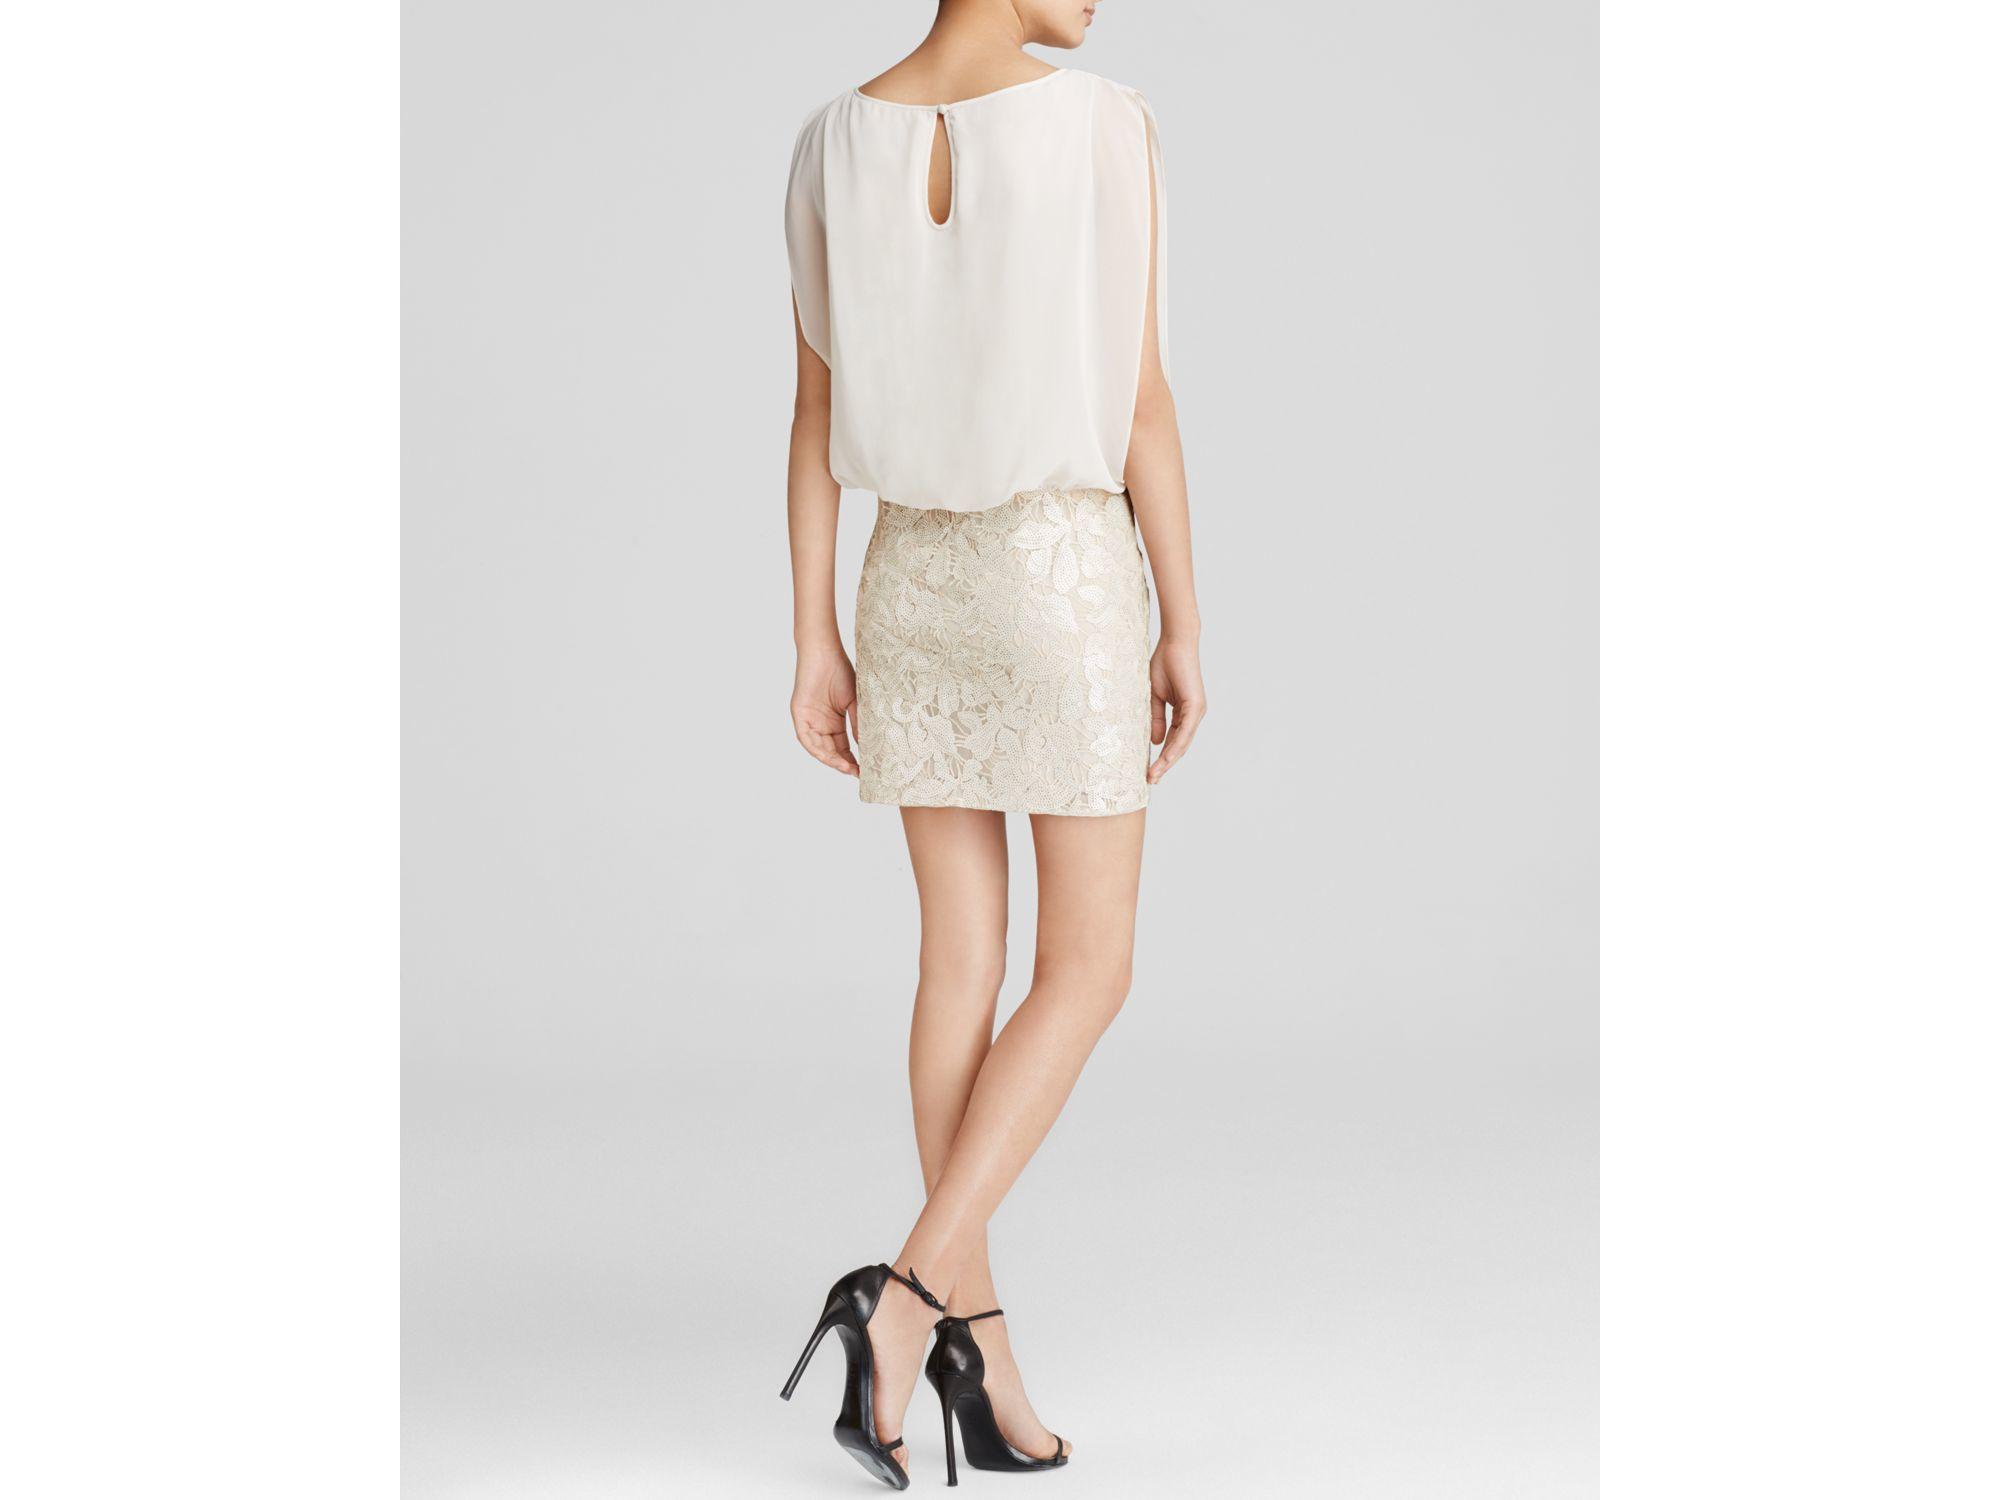 0e8aa66cf18 Aidan Mattox Dress - Sleeveless Chiffon Blouson Bodice   Sequin Lace ...